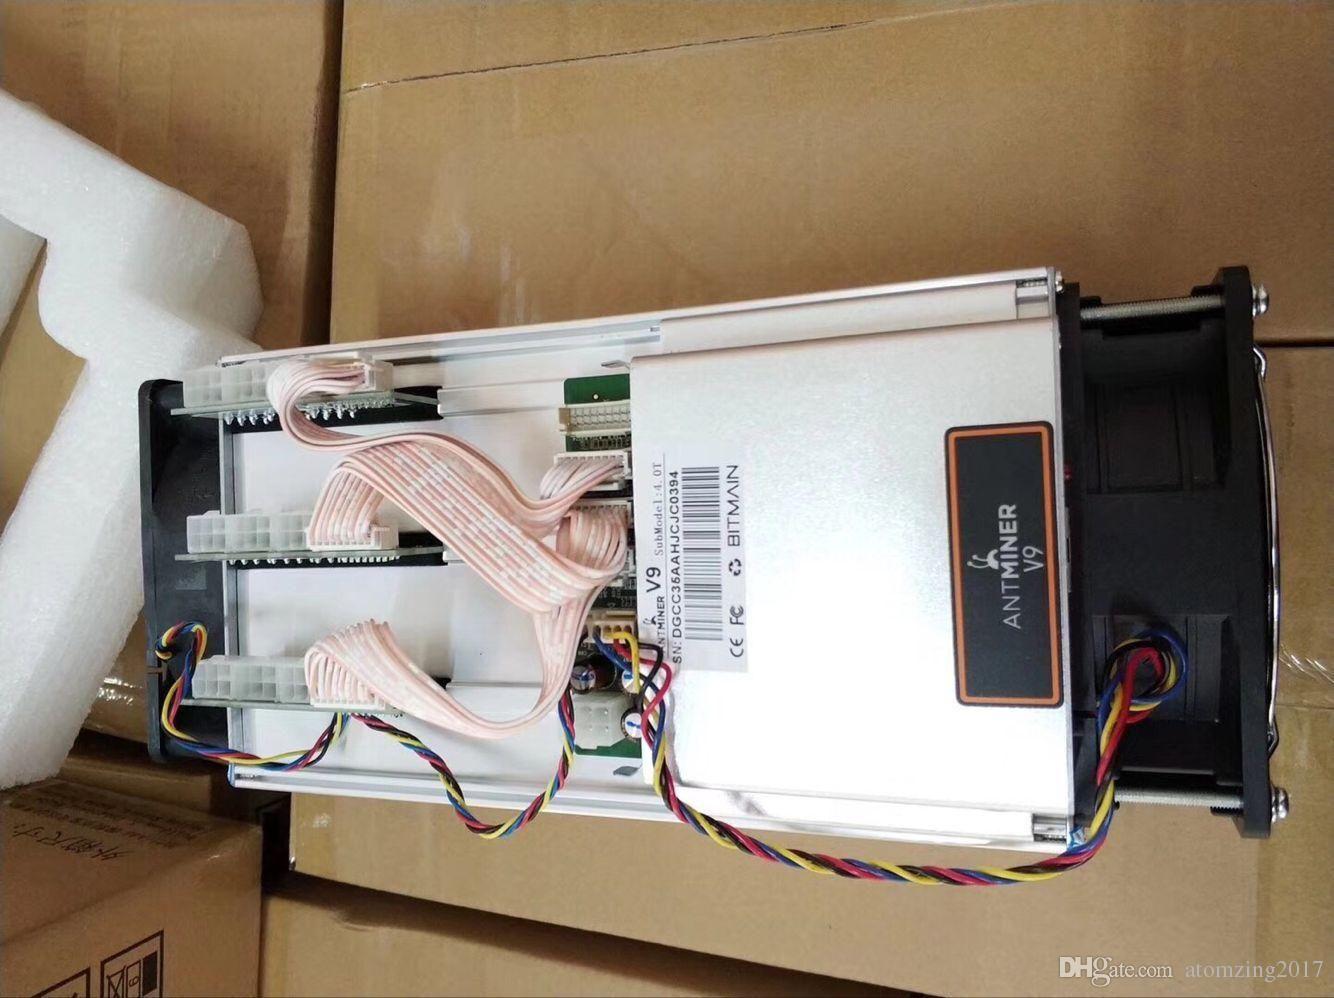 100% Original New Antminer V9 4TH/s Asic Miner BTC V9 Miner Btc Mining  Machine Free Shipping DHL